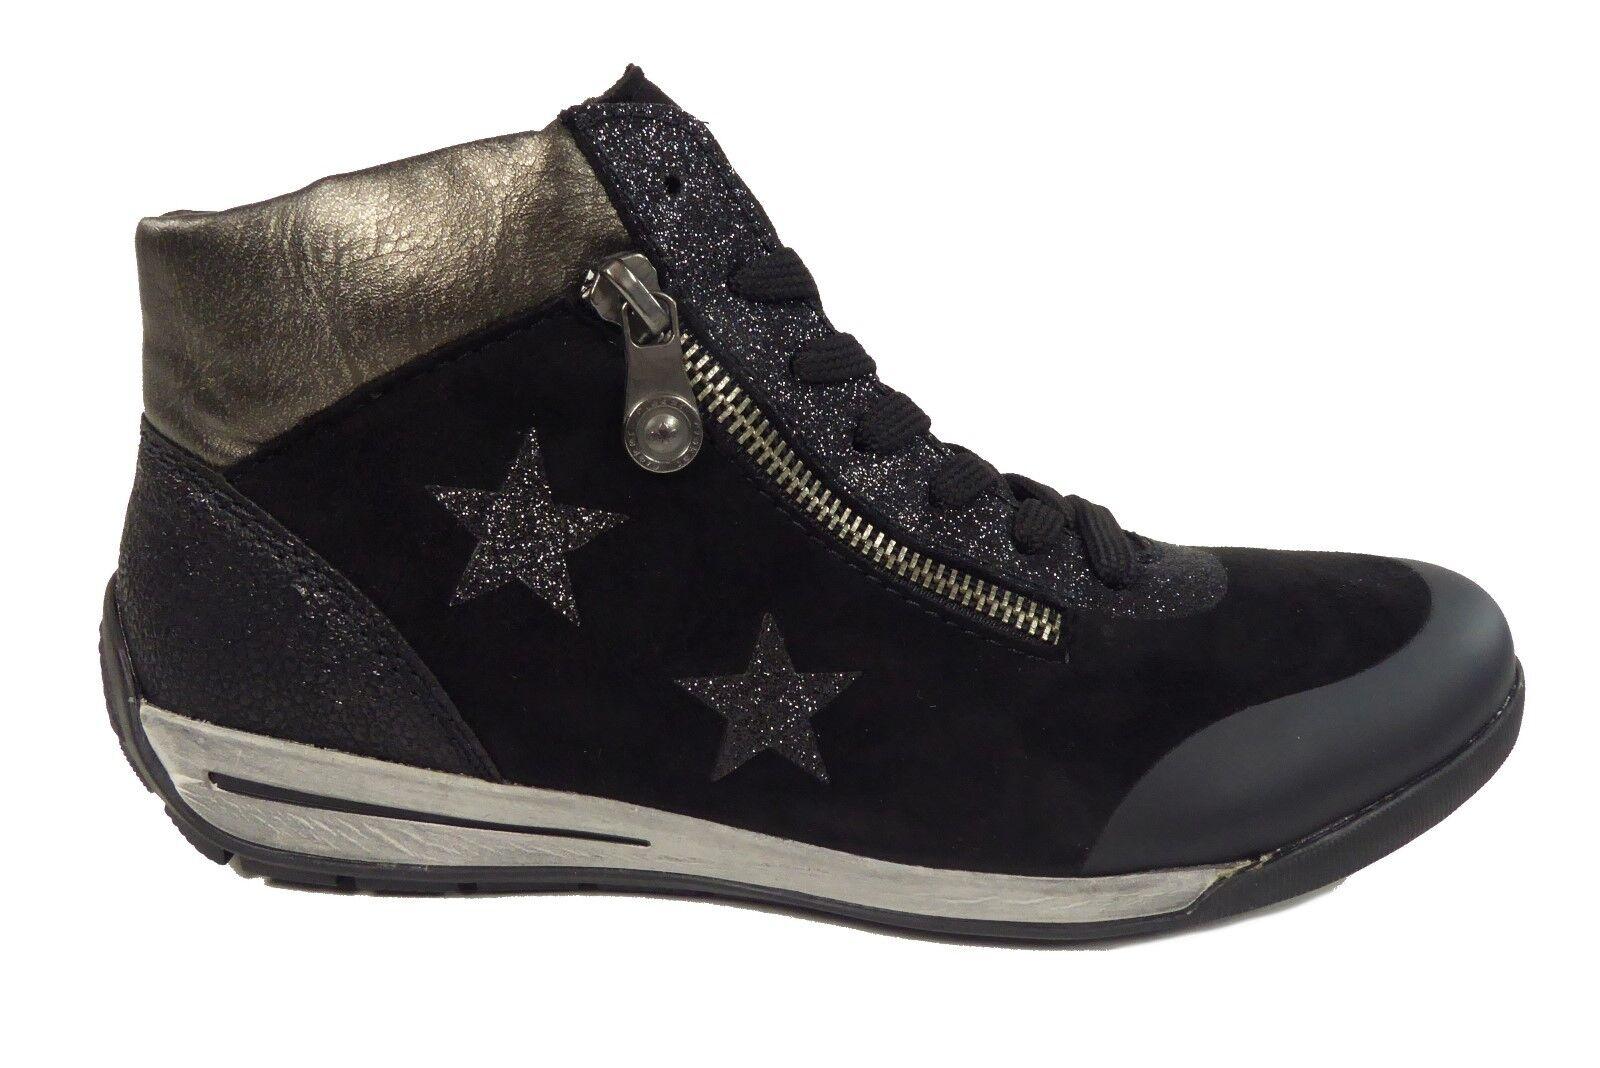 Rieker Damenschuhe Stiefel Schwarz Warmfutter Reißverschluss+Schnürung M3033-01